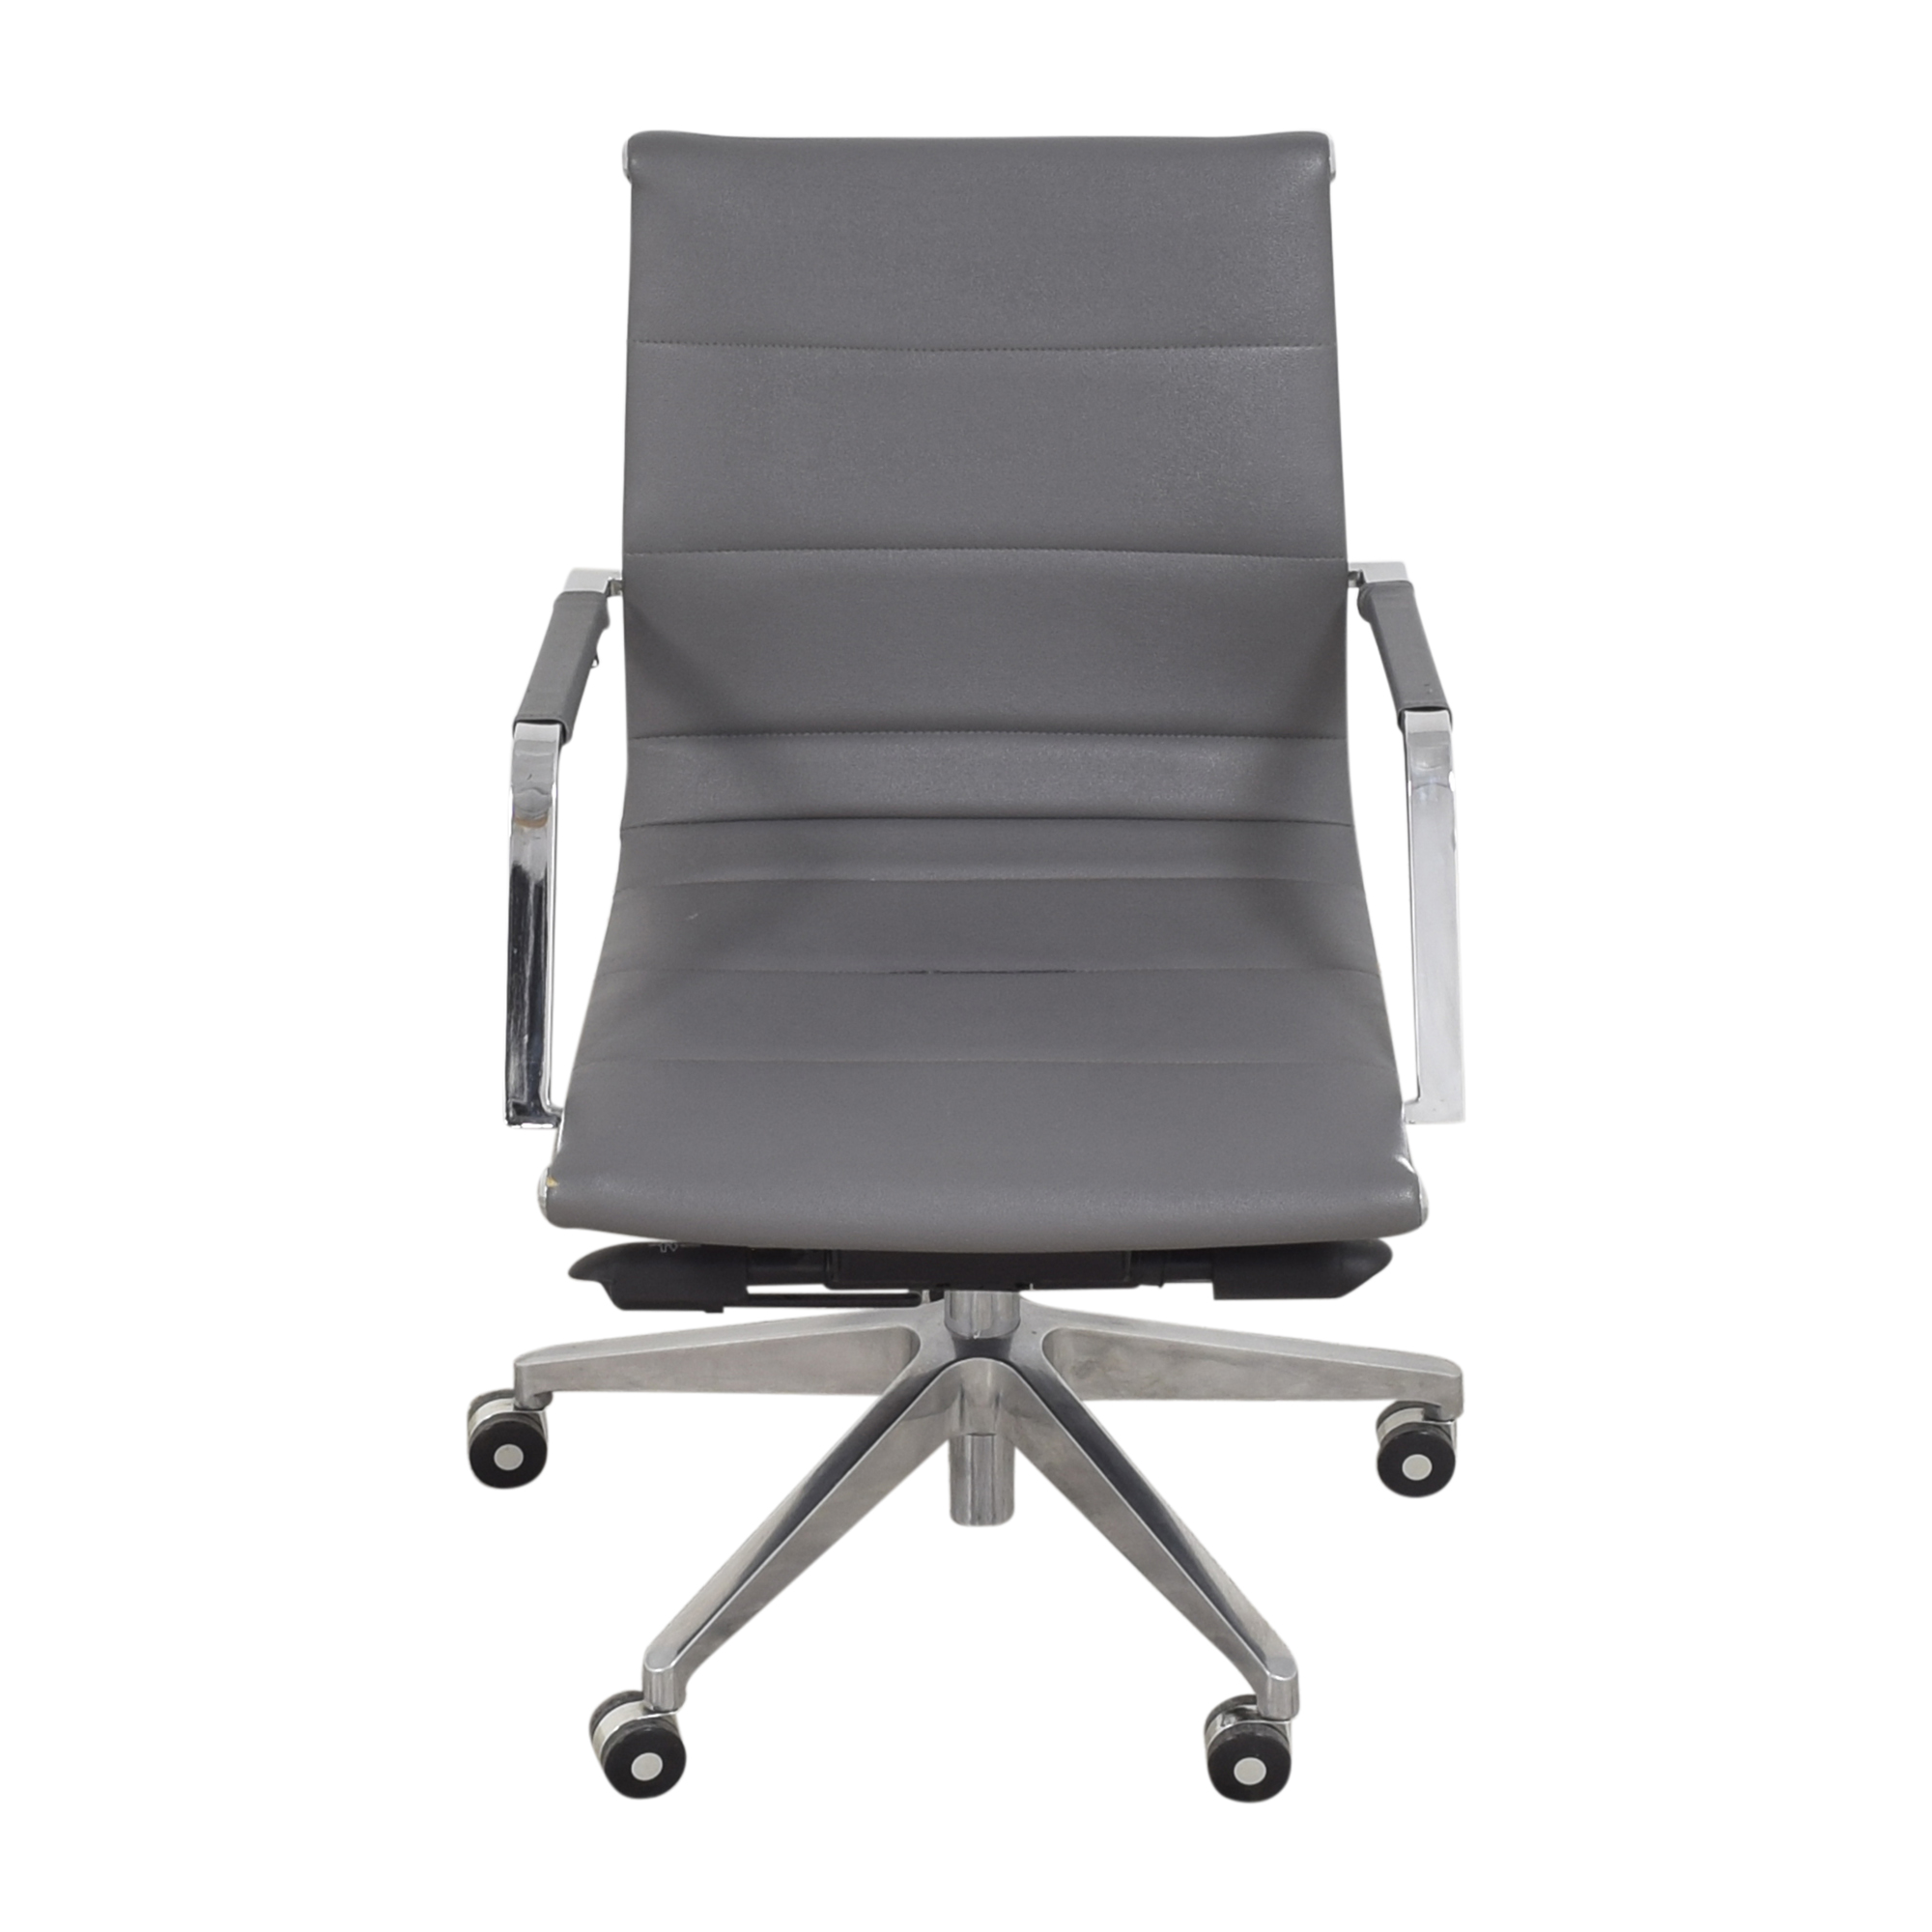 shop Jesper Office Adjustable Desk Chair Jesper Office Home Office Chairs